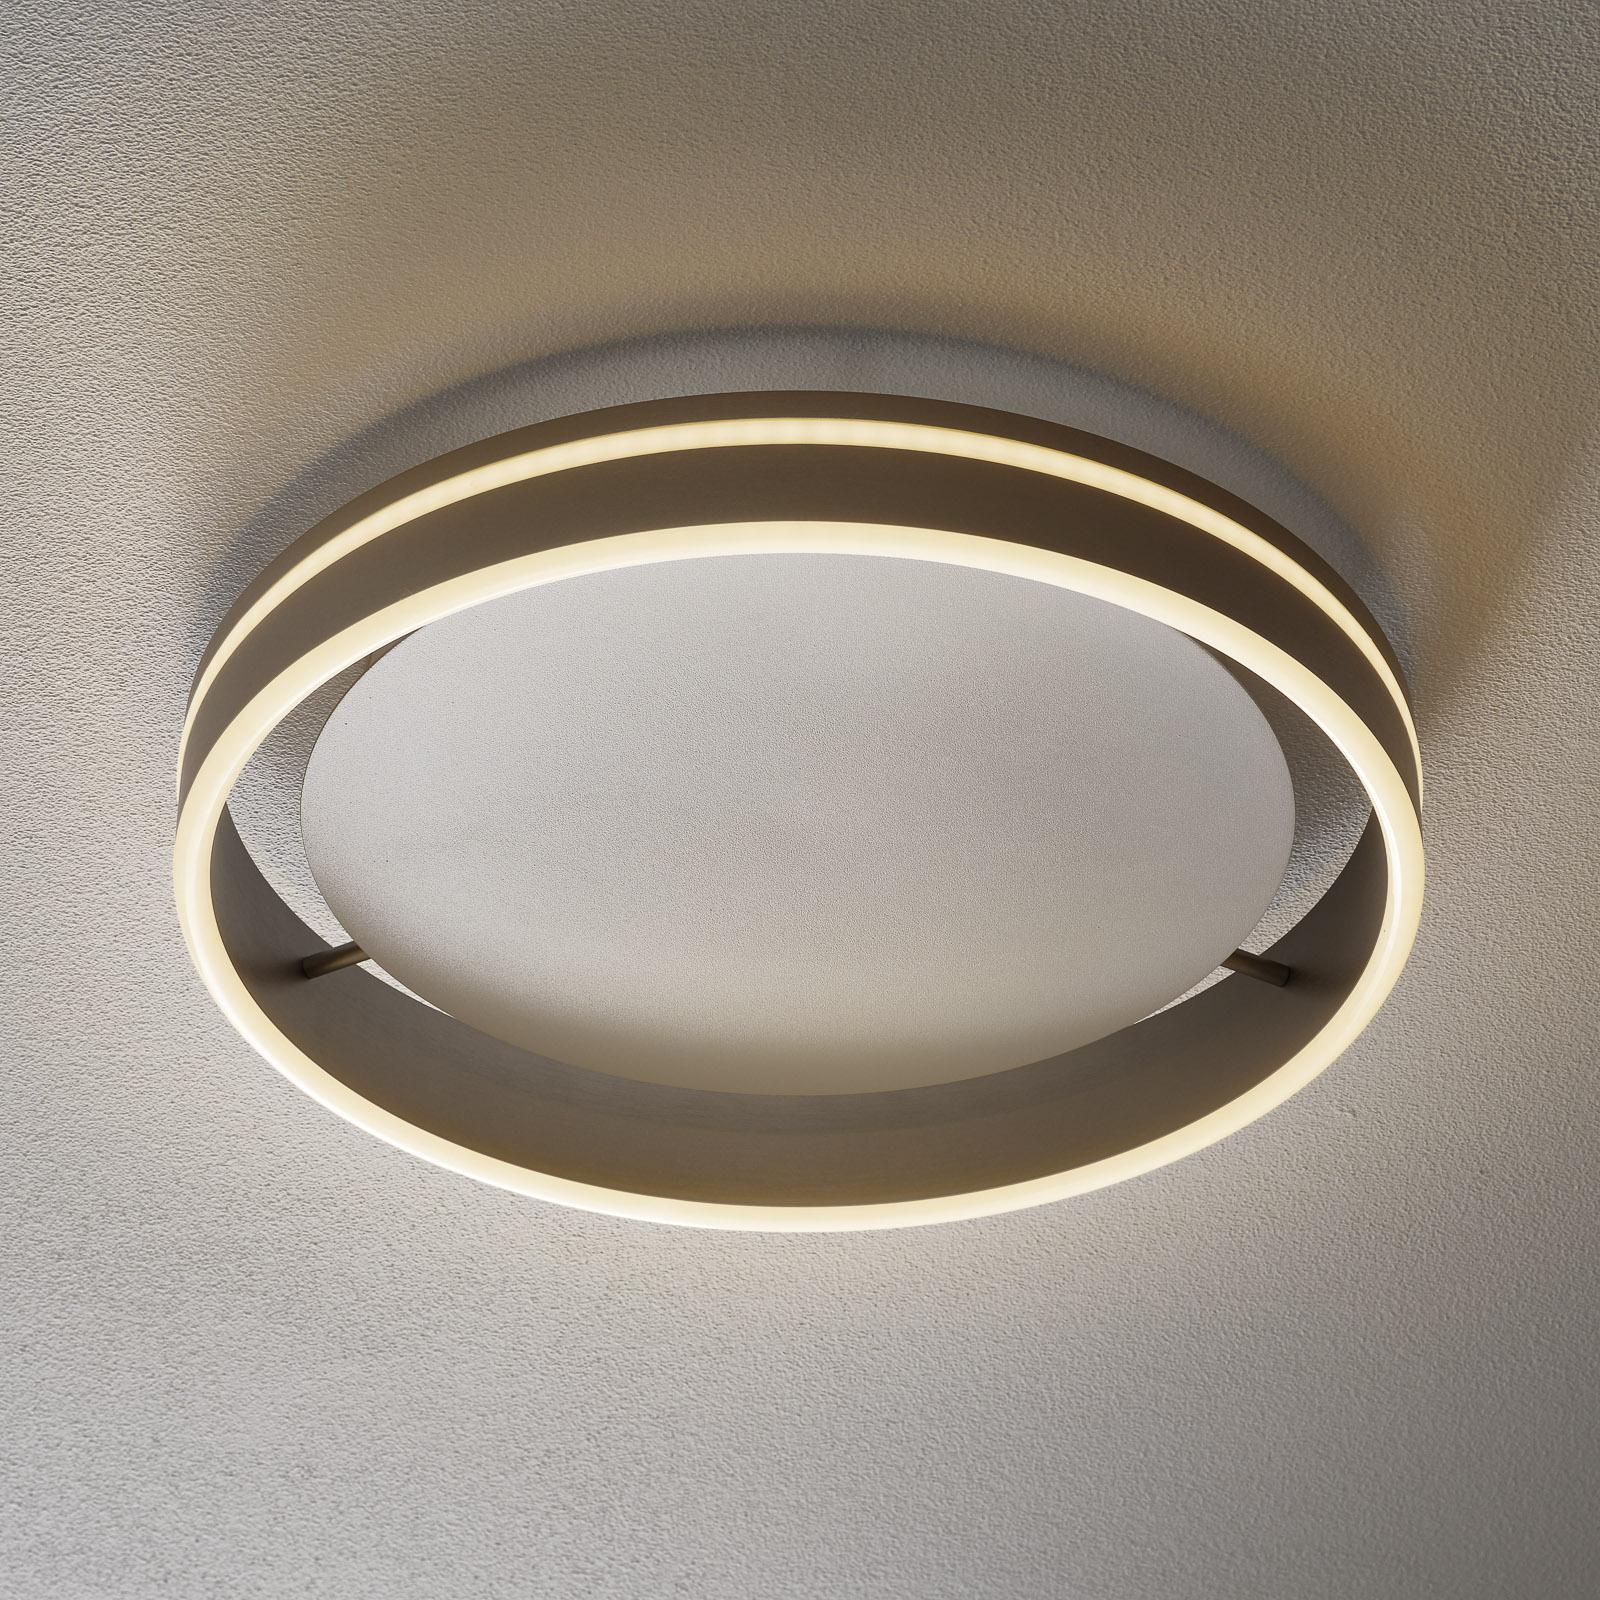 Paul Neuhaus Q-VITO LED-kattovalaisin 40 cm teräs